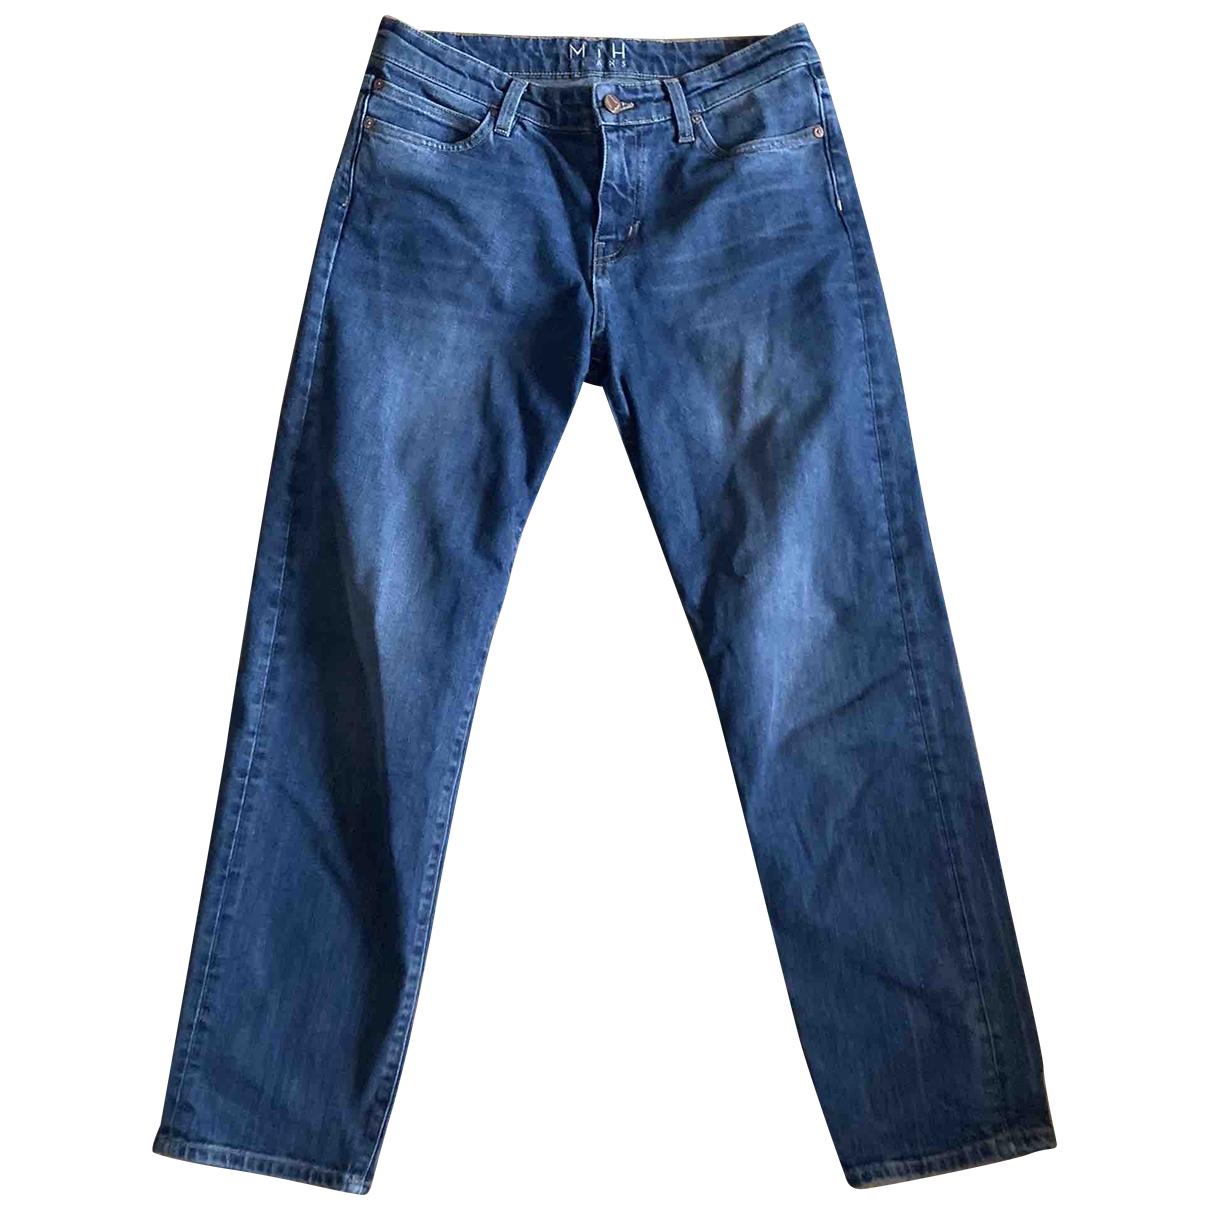 Vaquero boyfriend Mih Jeans